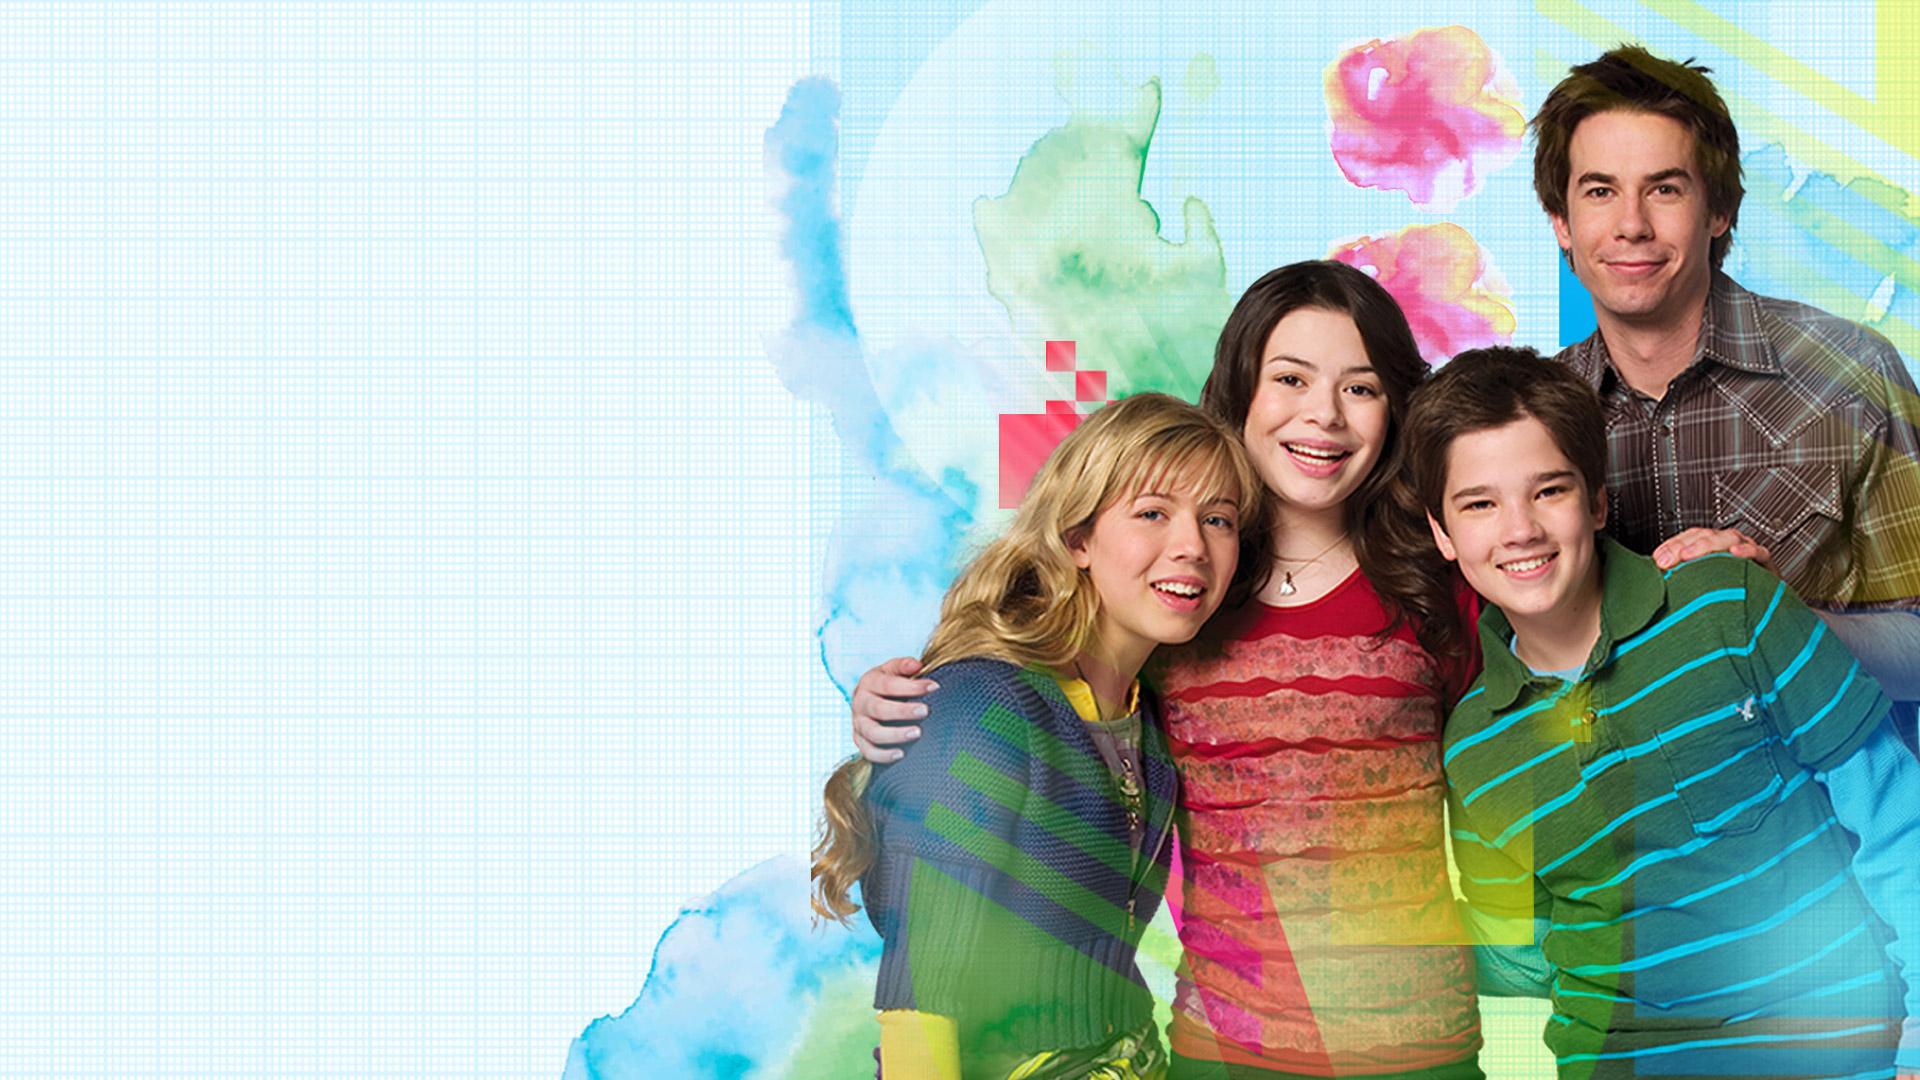 imust have locker 239 full episode online